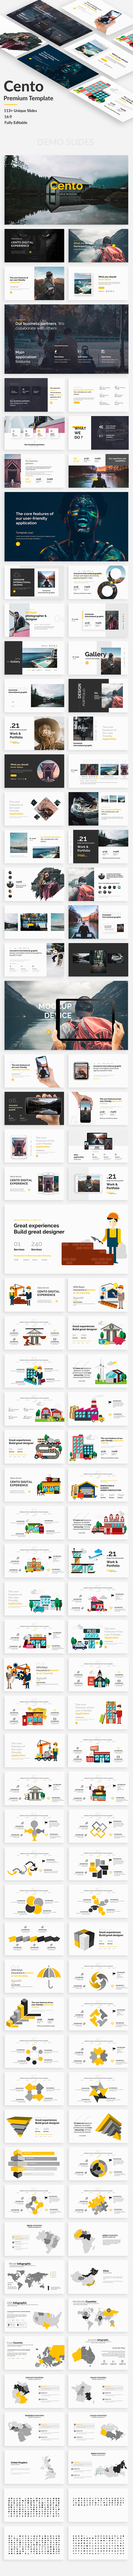 Cento Design Premium Google Slide Template - Google Slides Presentation Templates